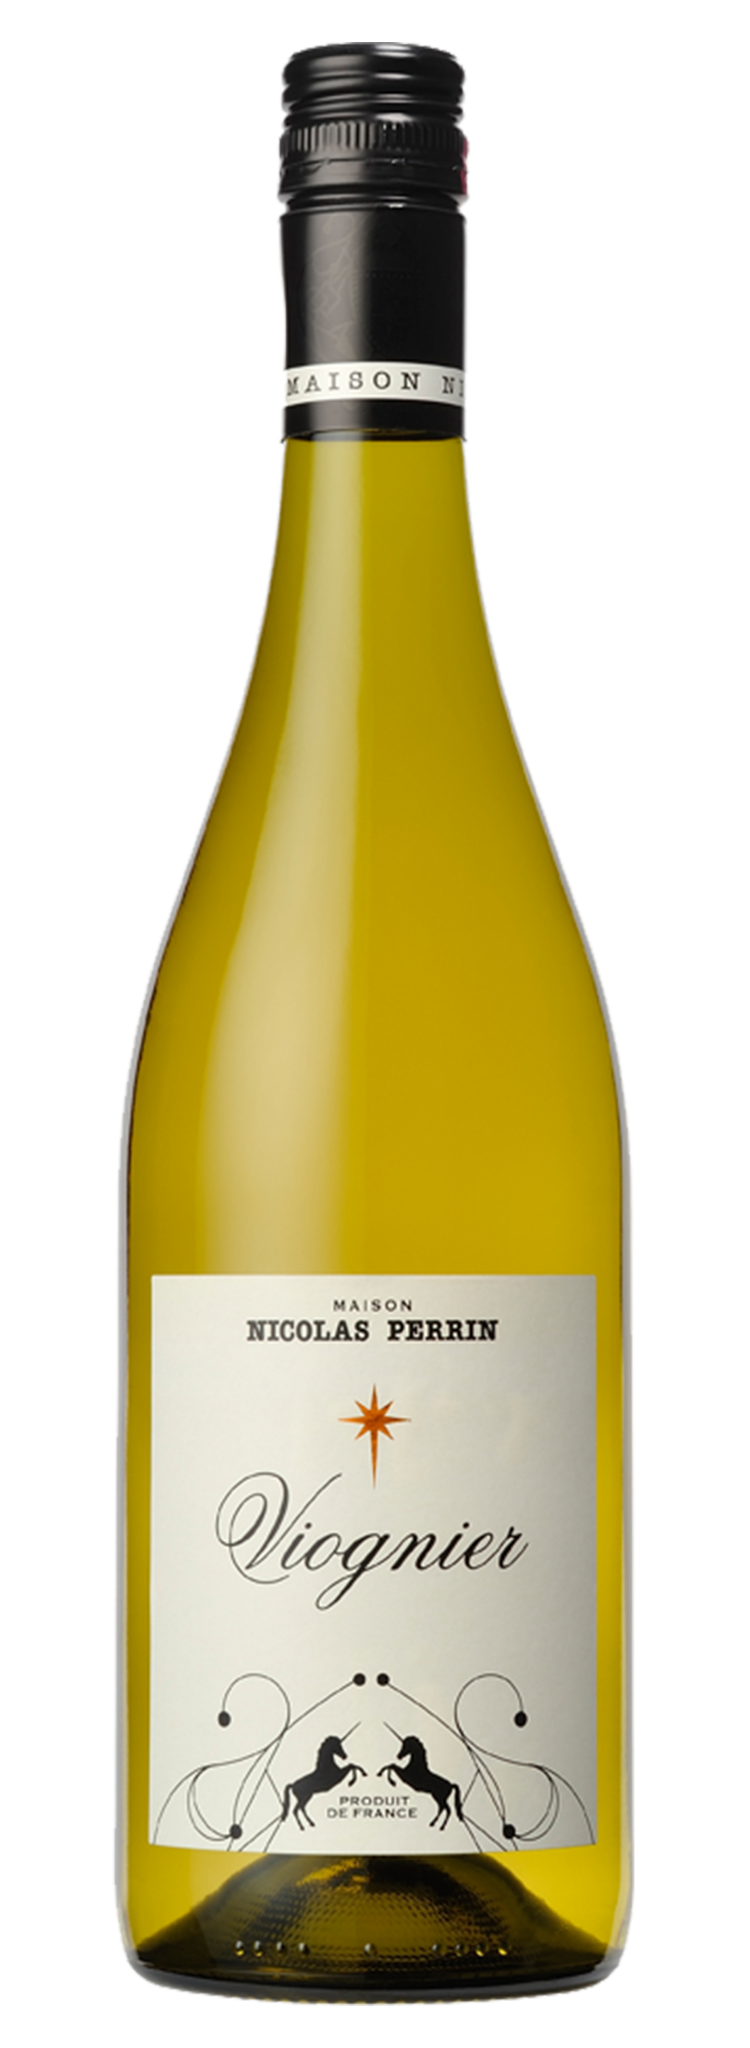 Maison Nicolas Perrin Viognier - 2015